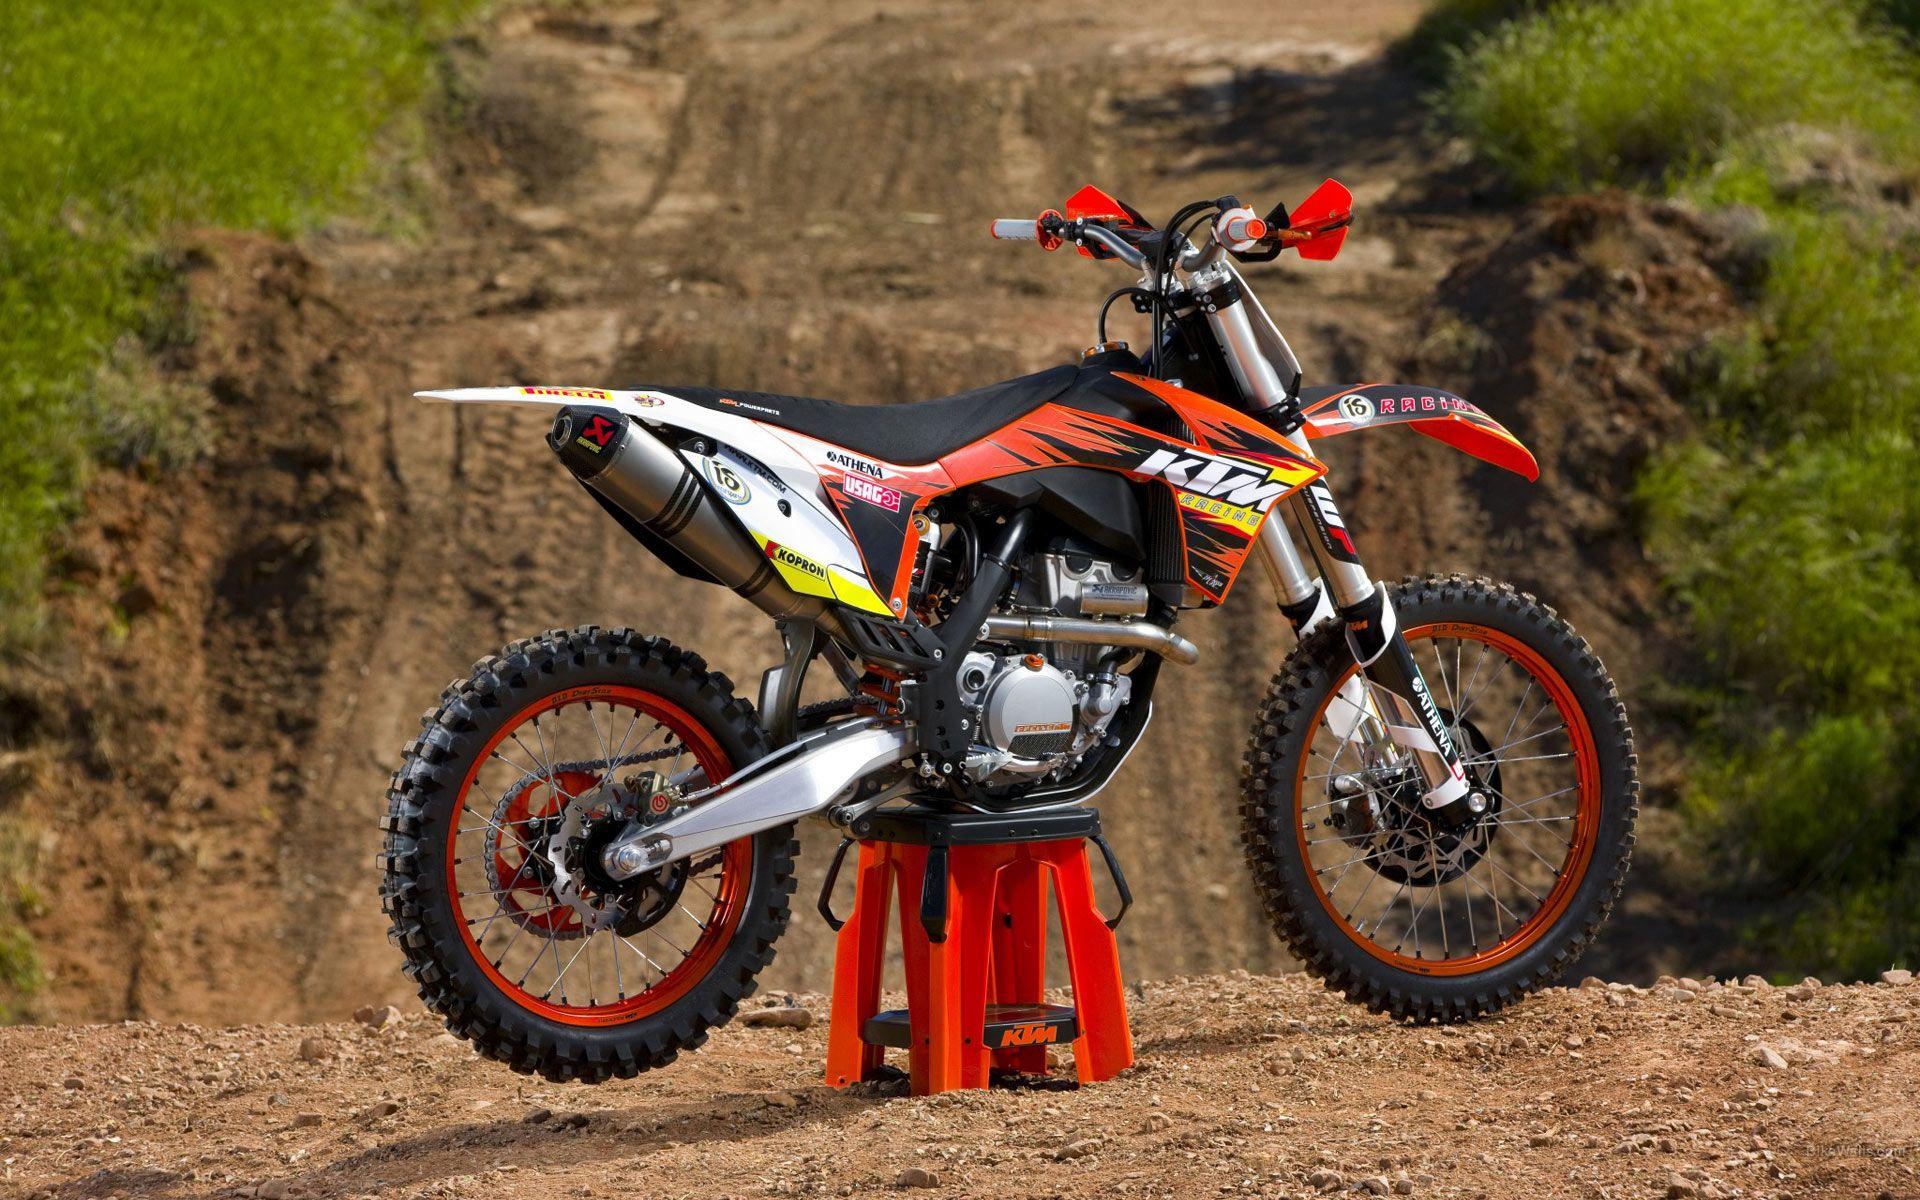 Ktm 450 Sx Motocross Wallpaper Desktop - Wallpapers motocross ktm wallpaper cave